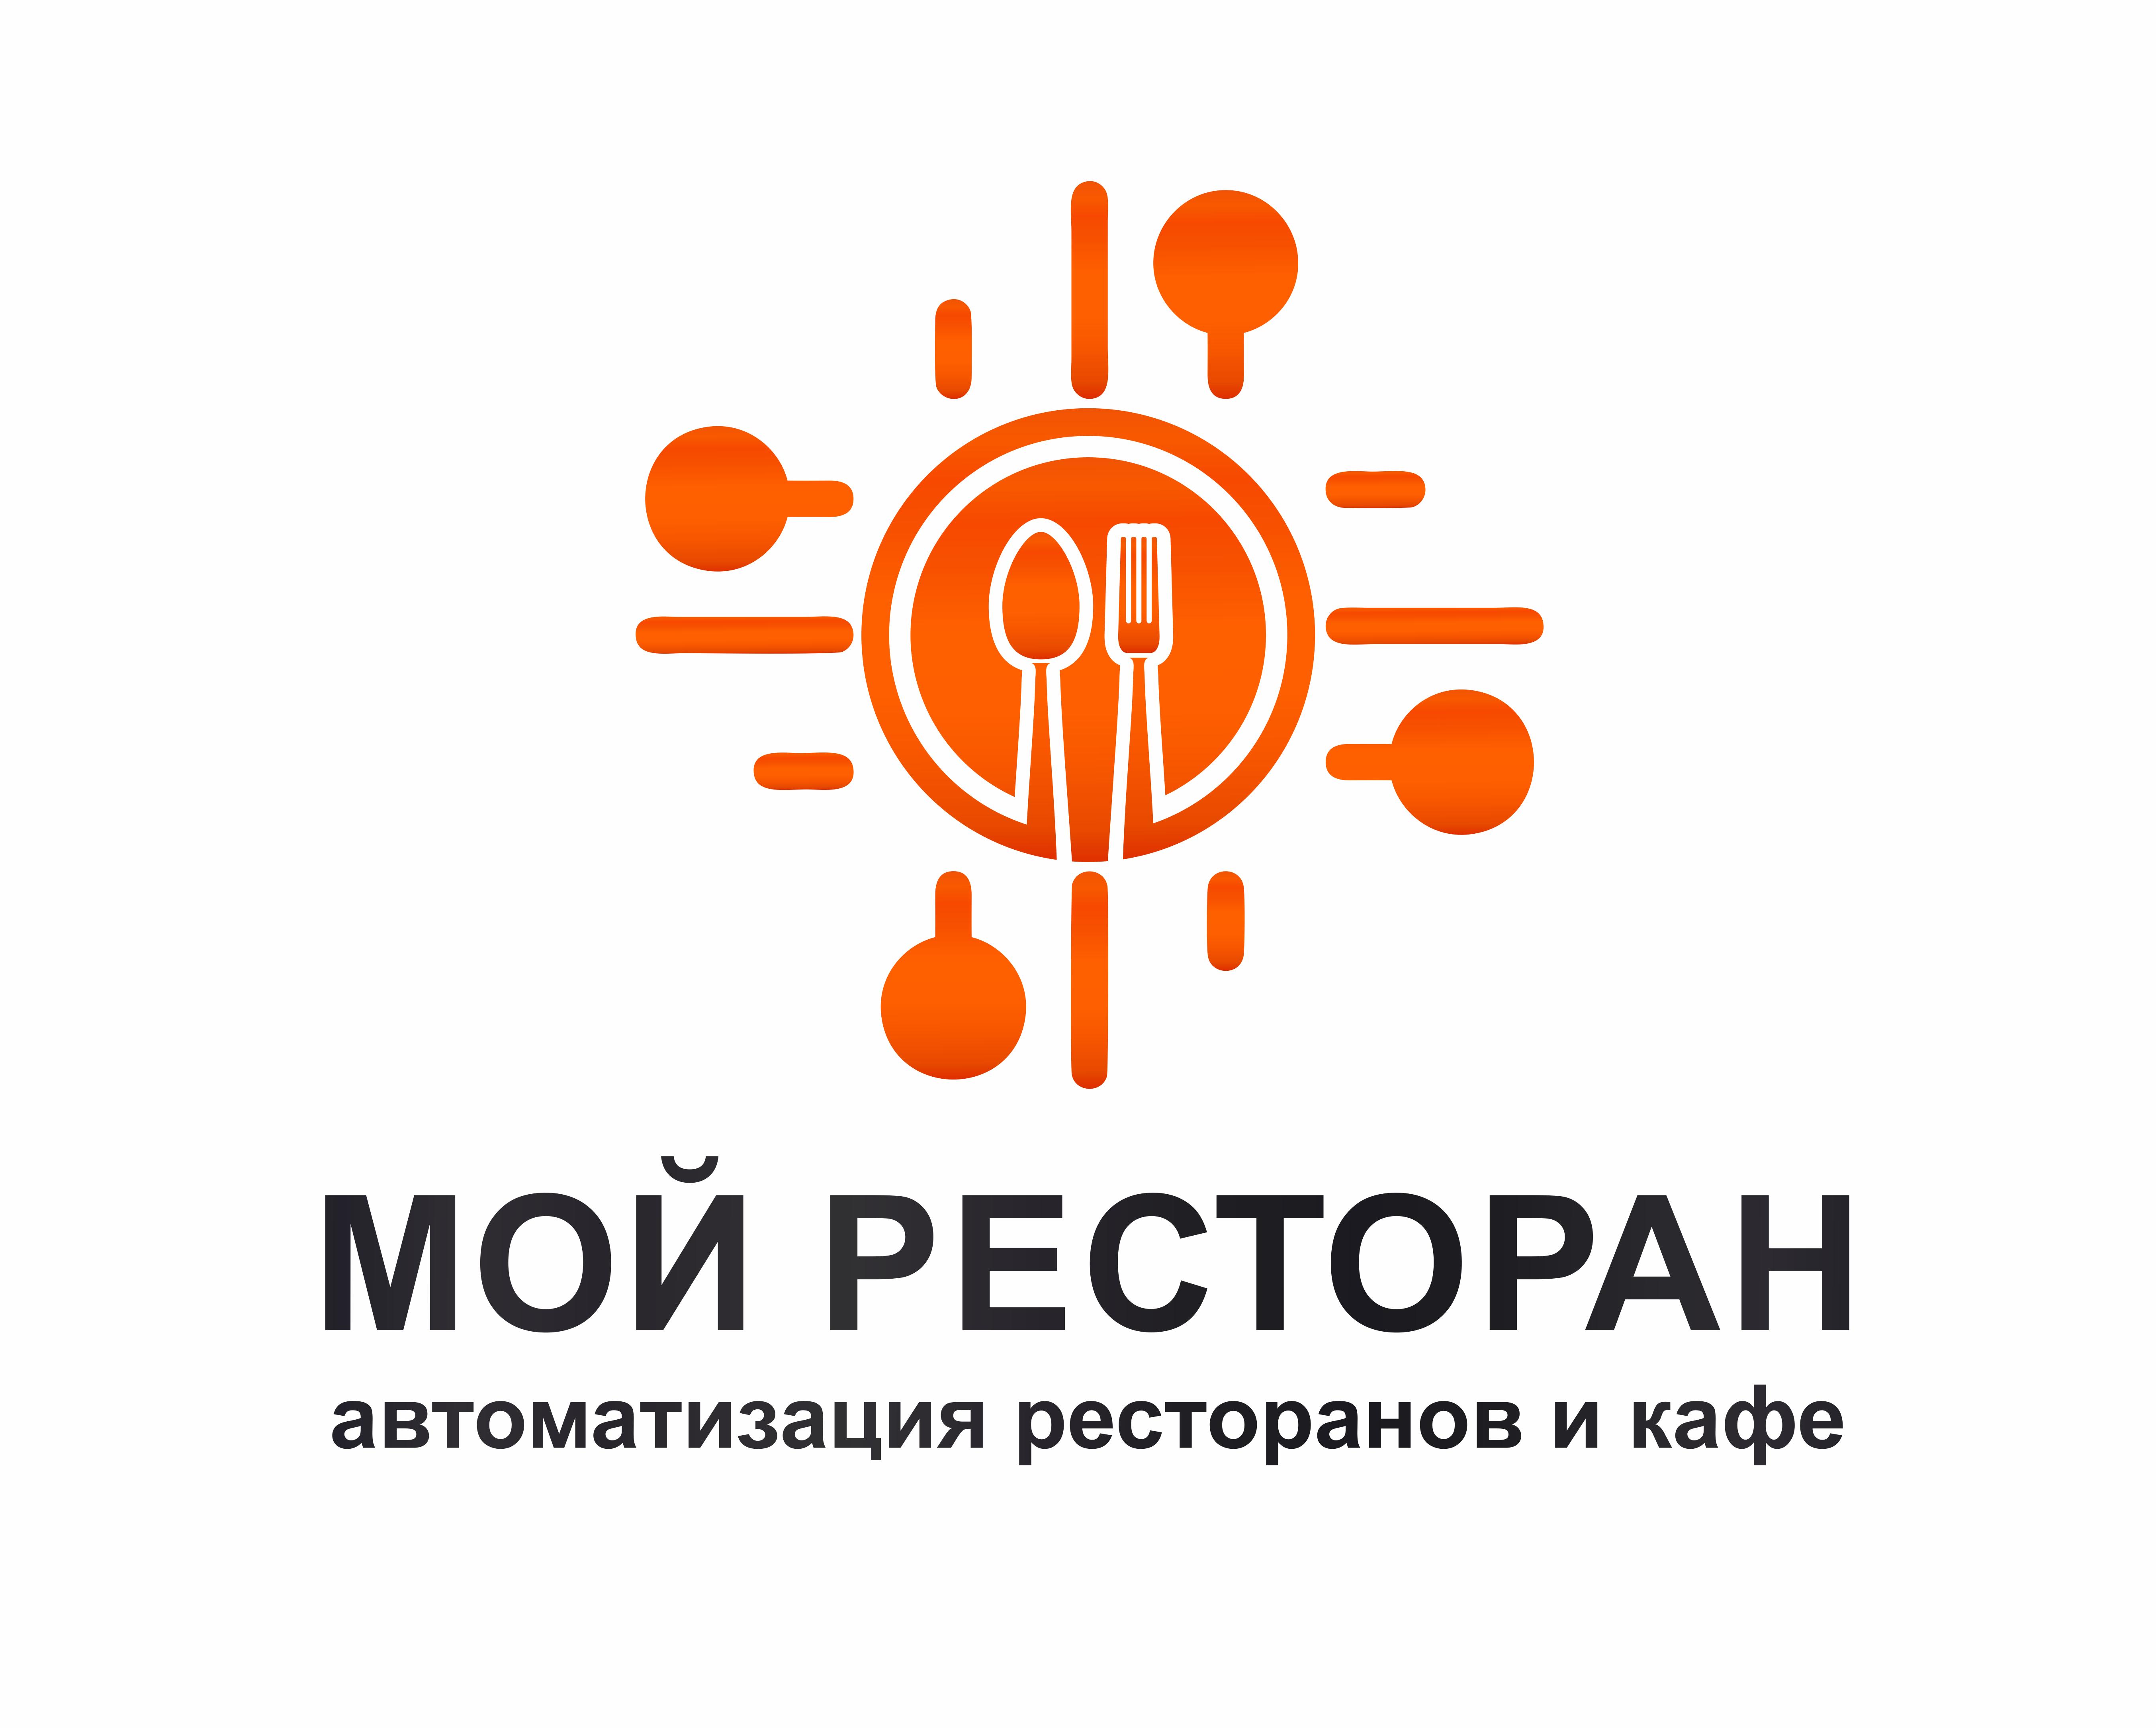 Разработать логотип и фавикон для IT- компании фото f_5285d53dda5cae27.png